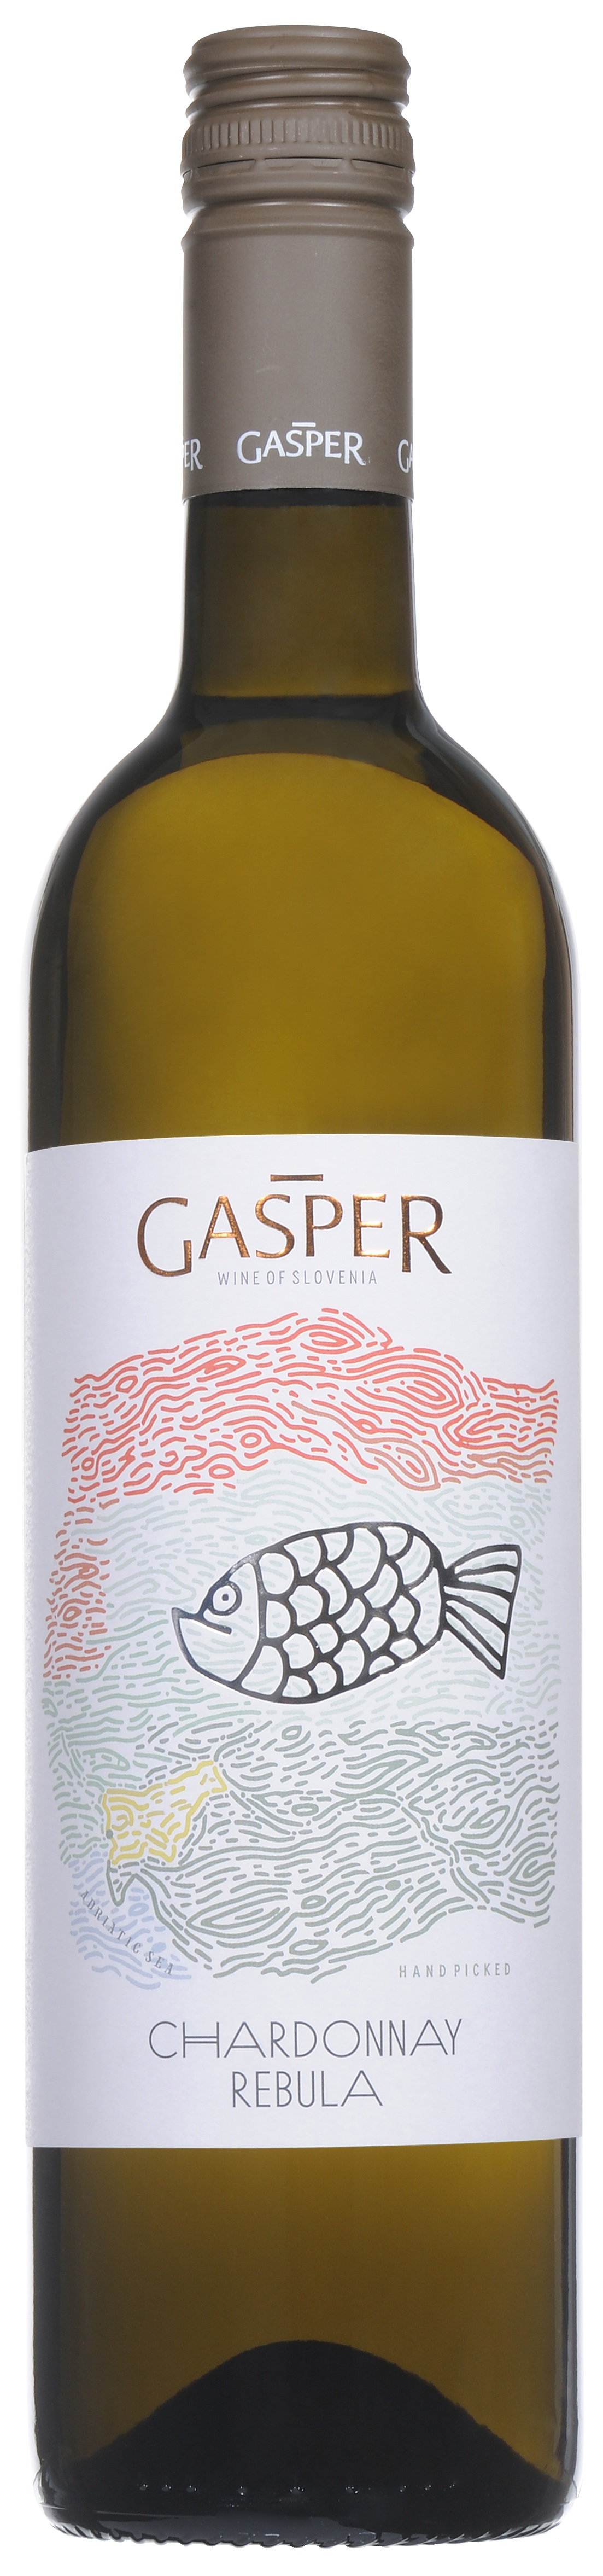 Gašper, Chardonnay/Rebula 2017